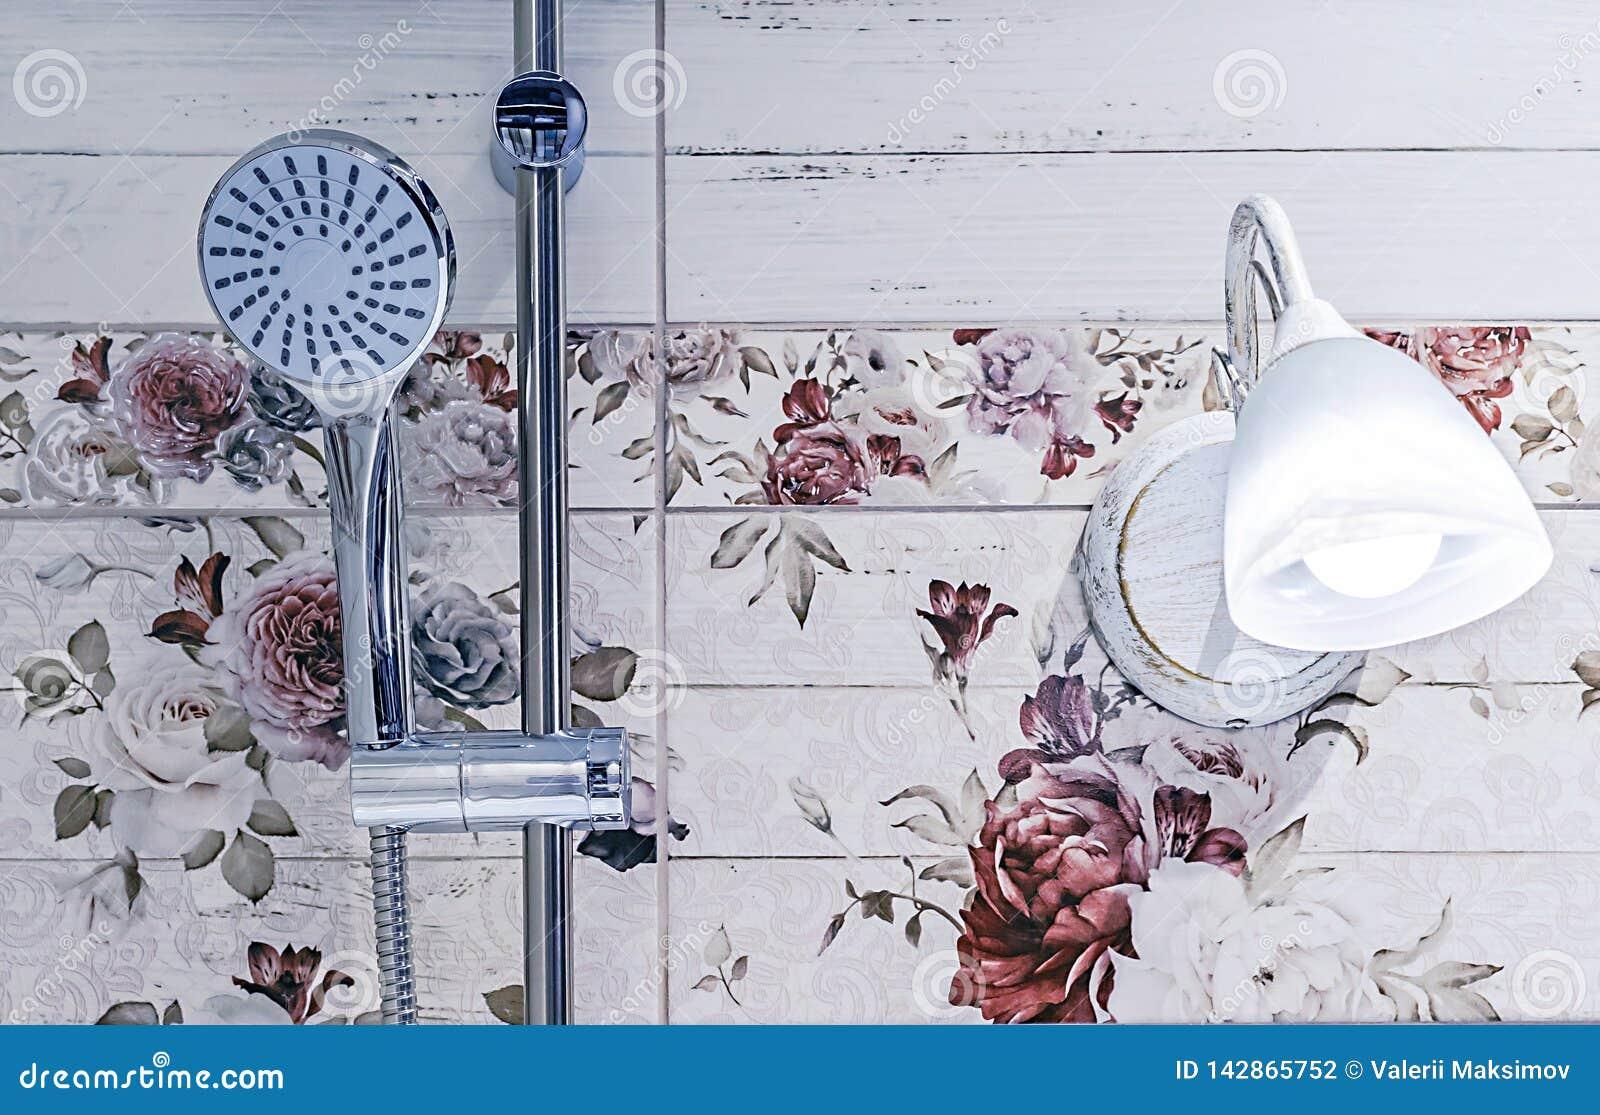 Chrome在卫生间内部的淋浴喷头